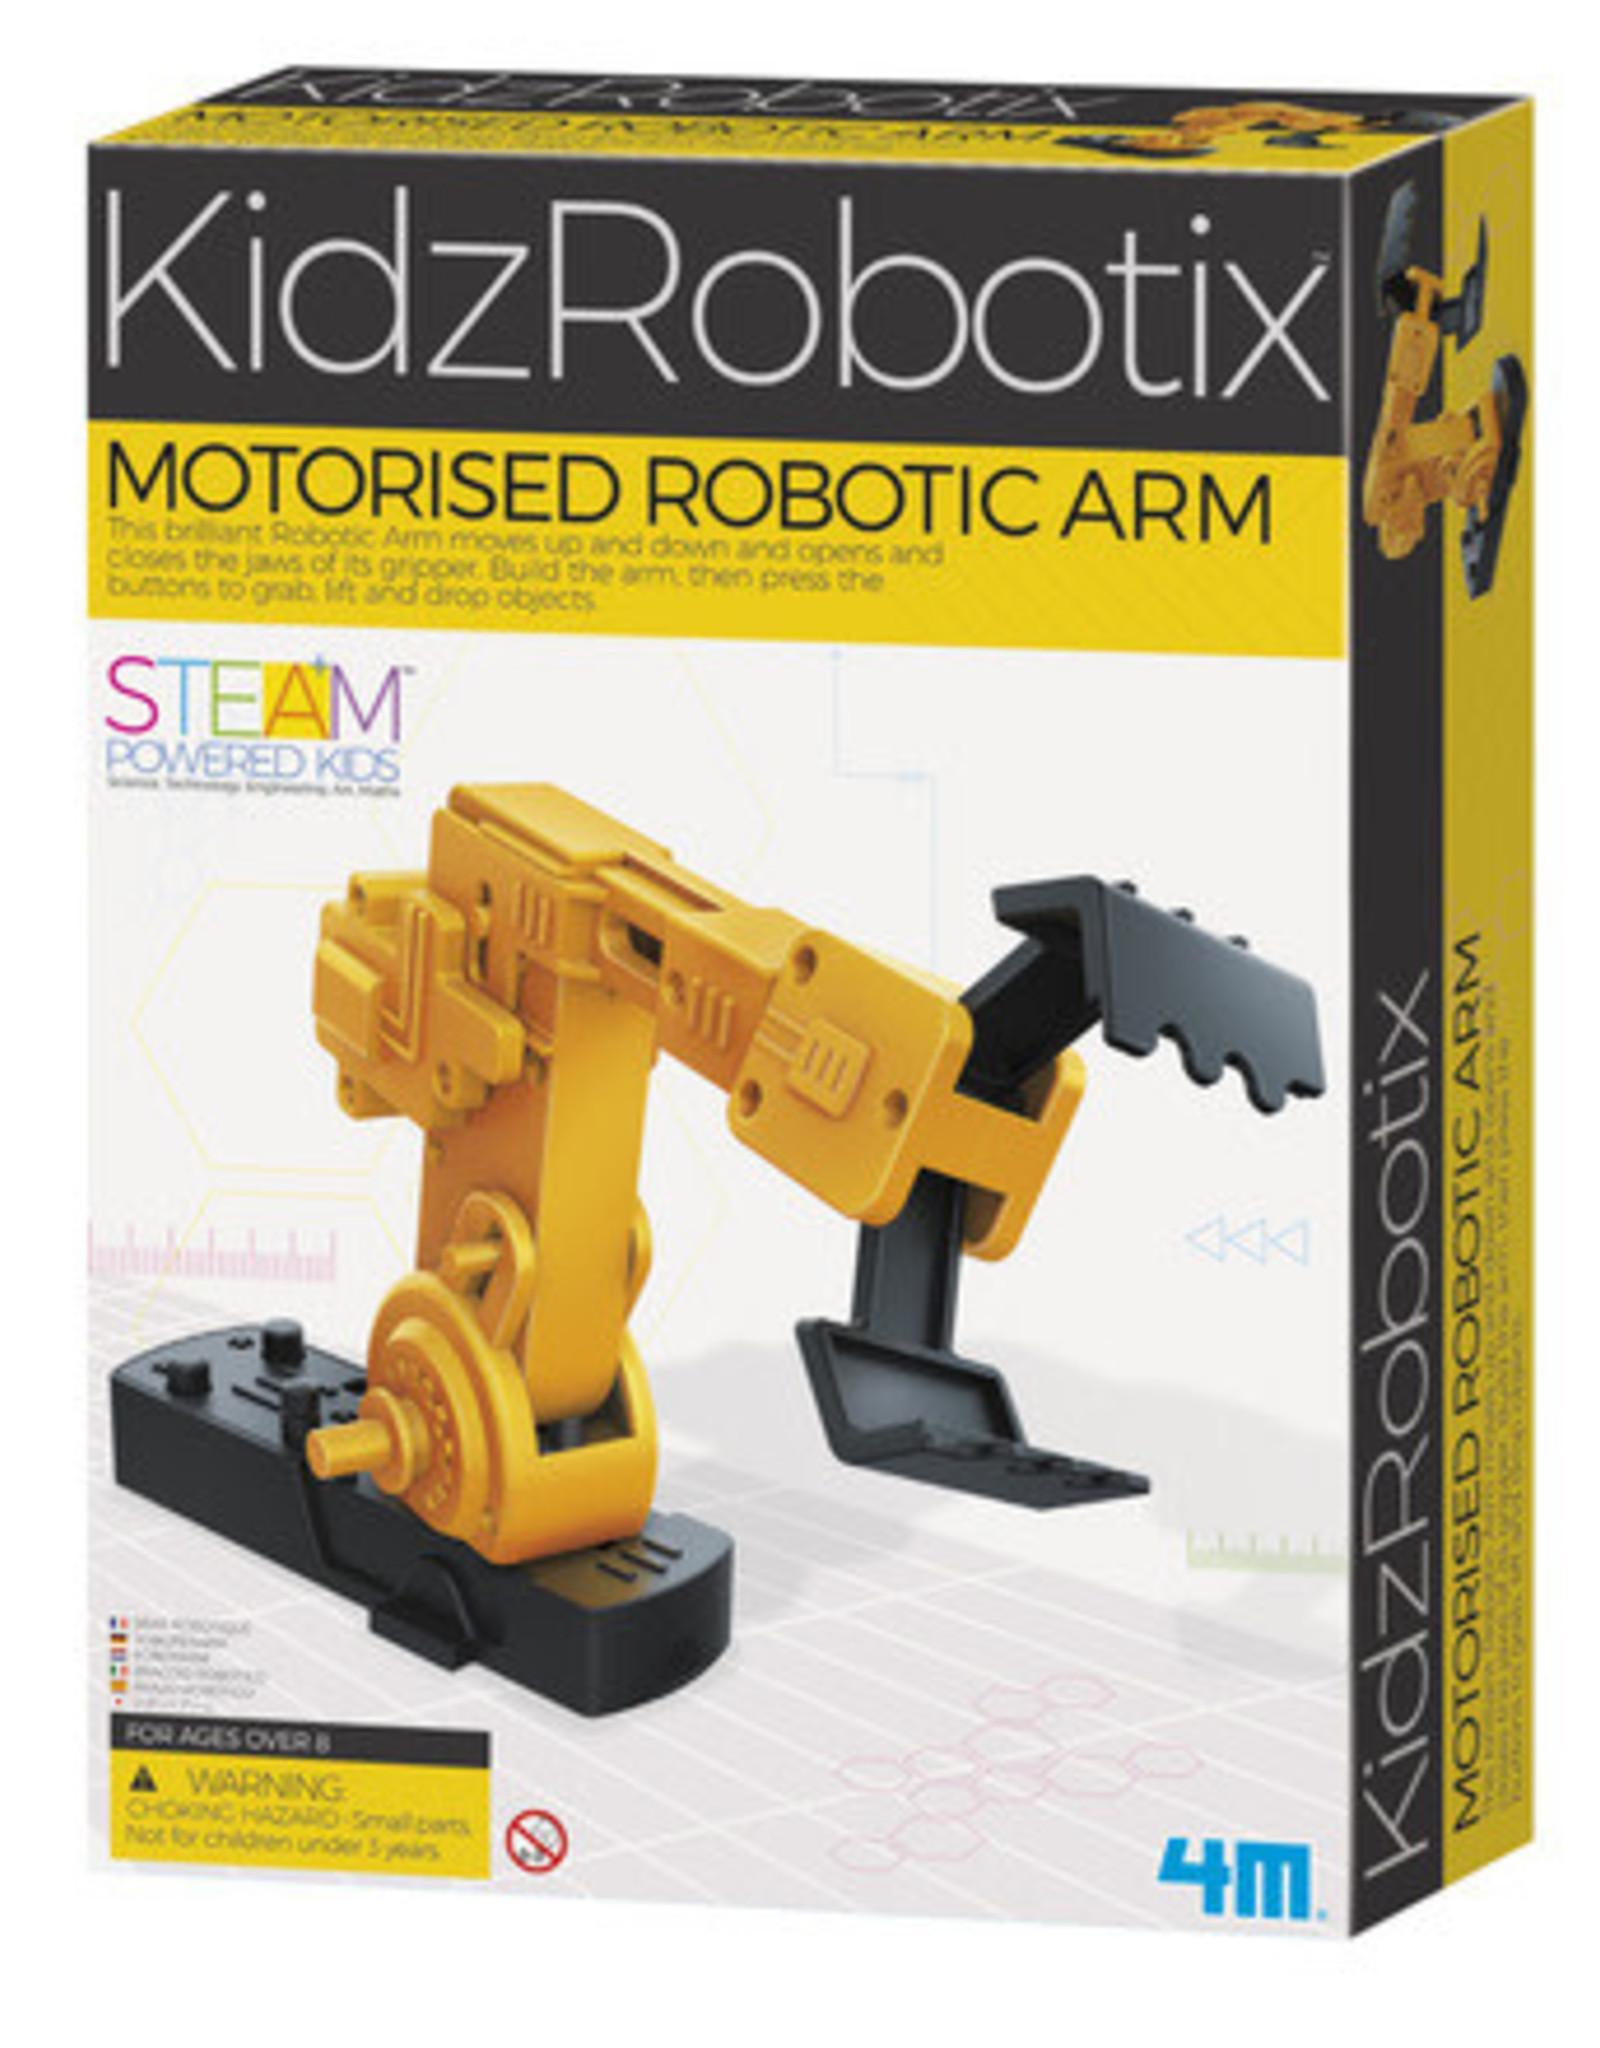 KidzRobotix Motorized Robotic Arm